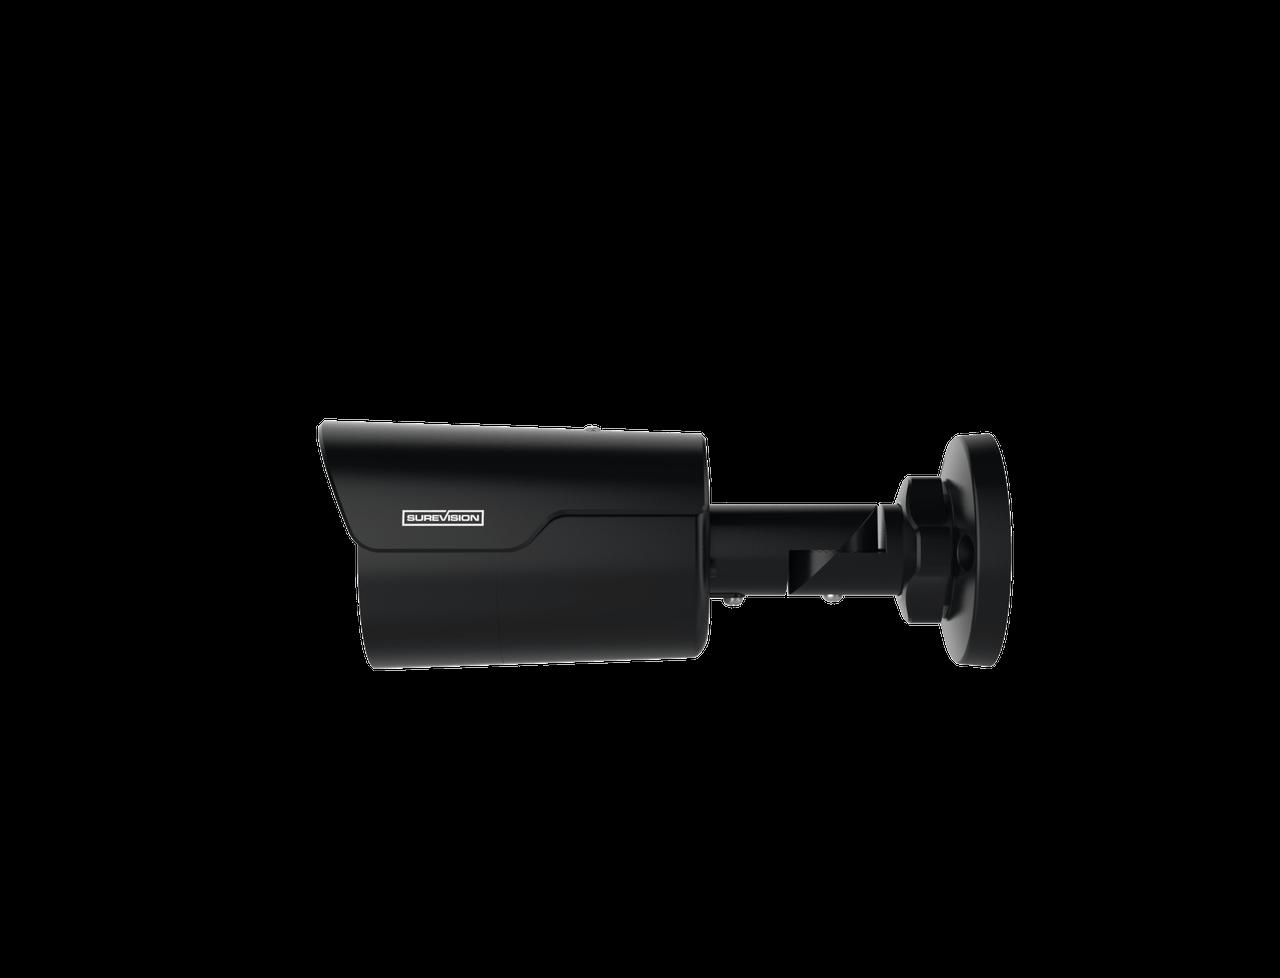 4K Mini Fixed Bullet Network Camera